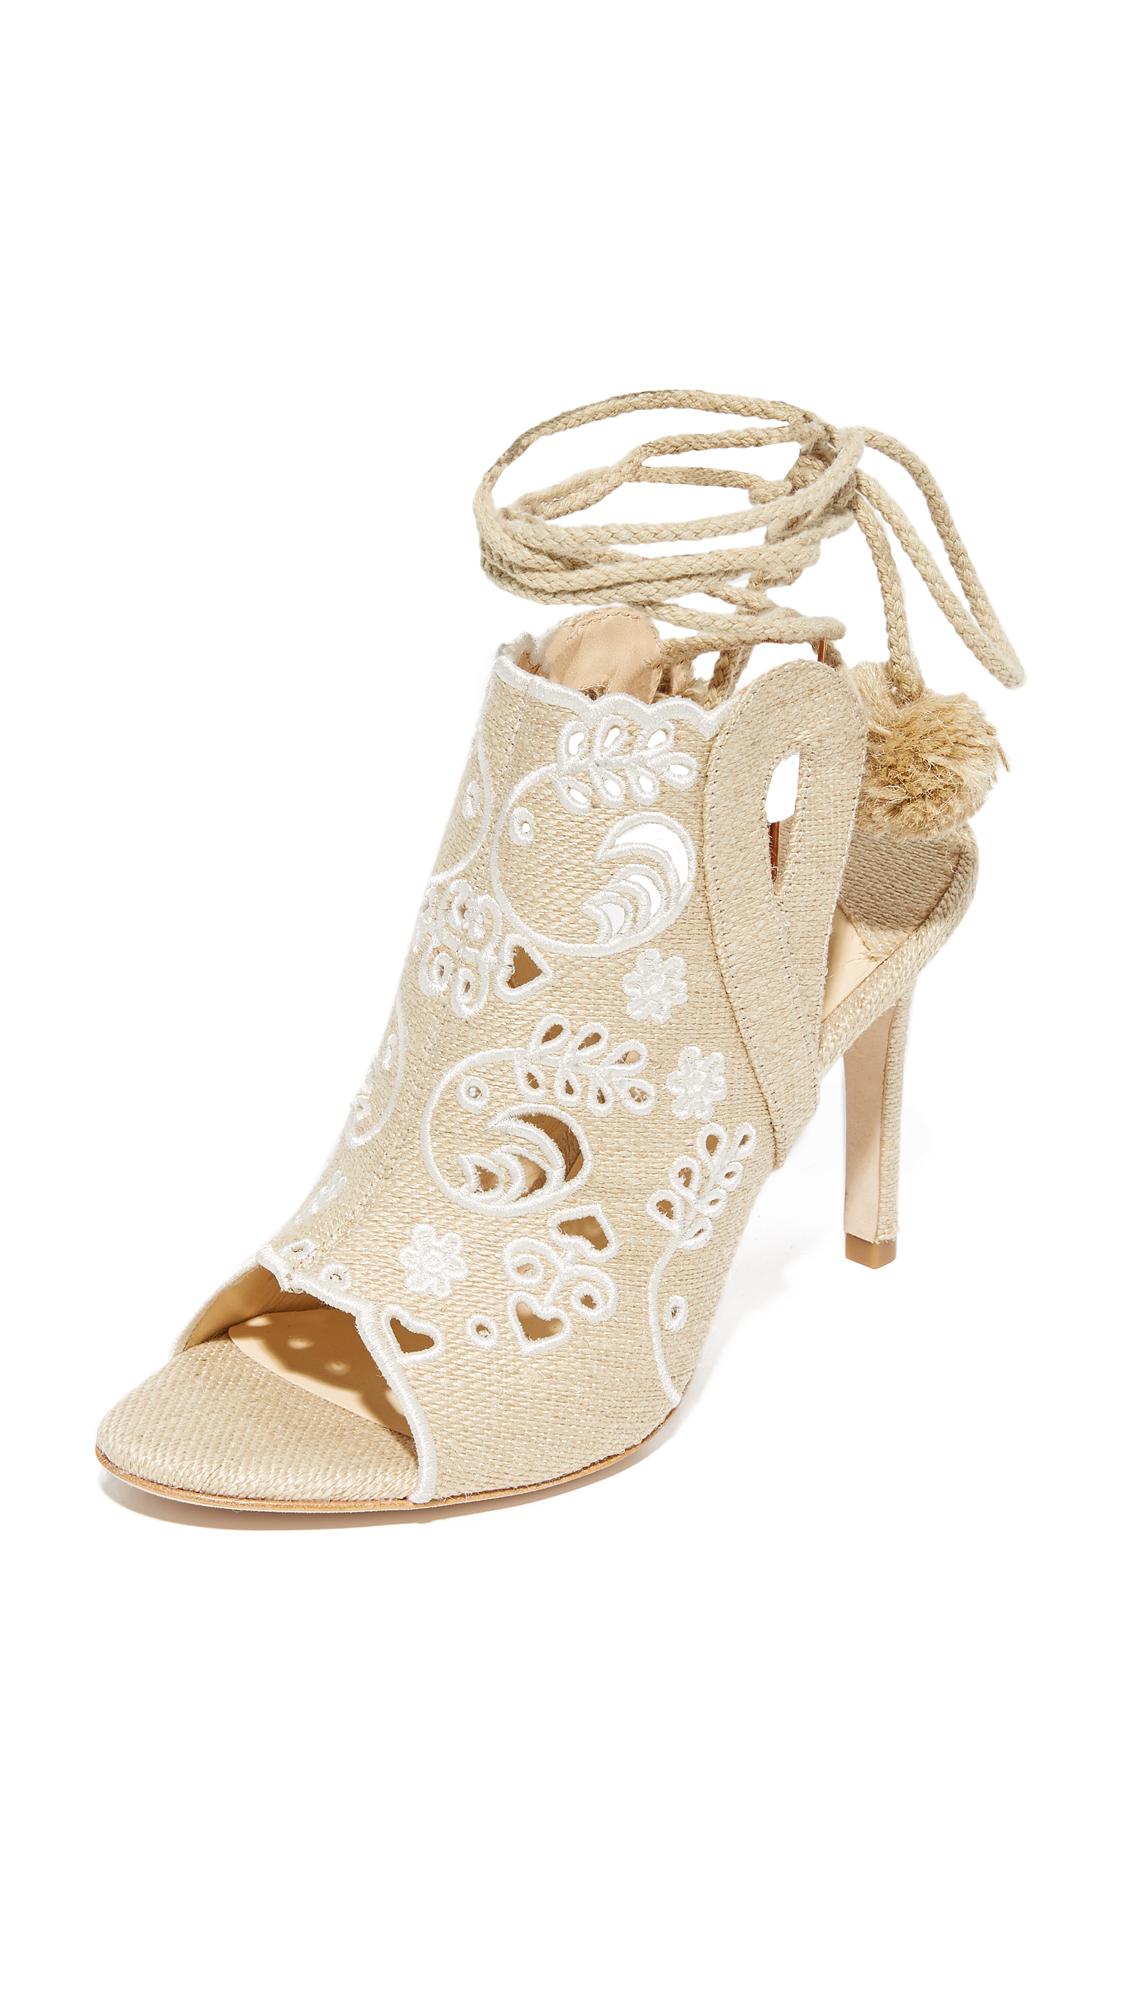 Isa Tapia Fox Glove Open Toe Sandals